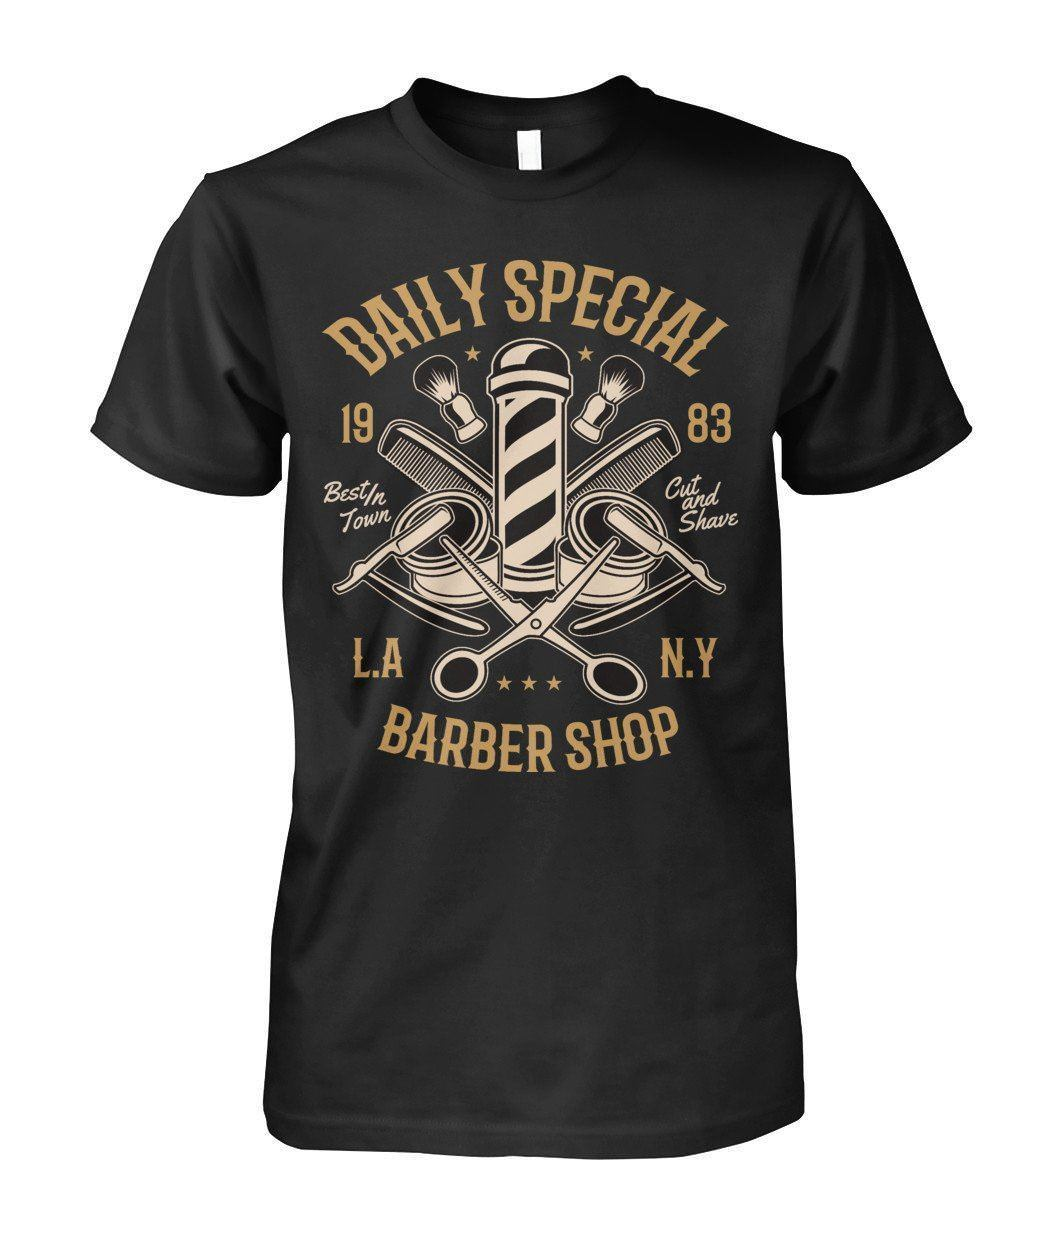 Lustige Kleidung Casual Kurzarm T-shirts Barber Shop Hemd Täglichen Spezielle Bräutigam Stil Hipster Herren Unisex Damen T-shirt T-shirt